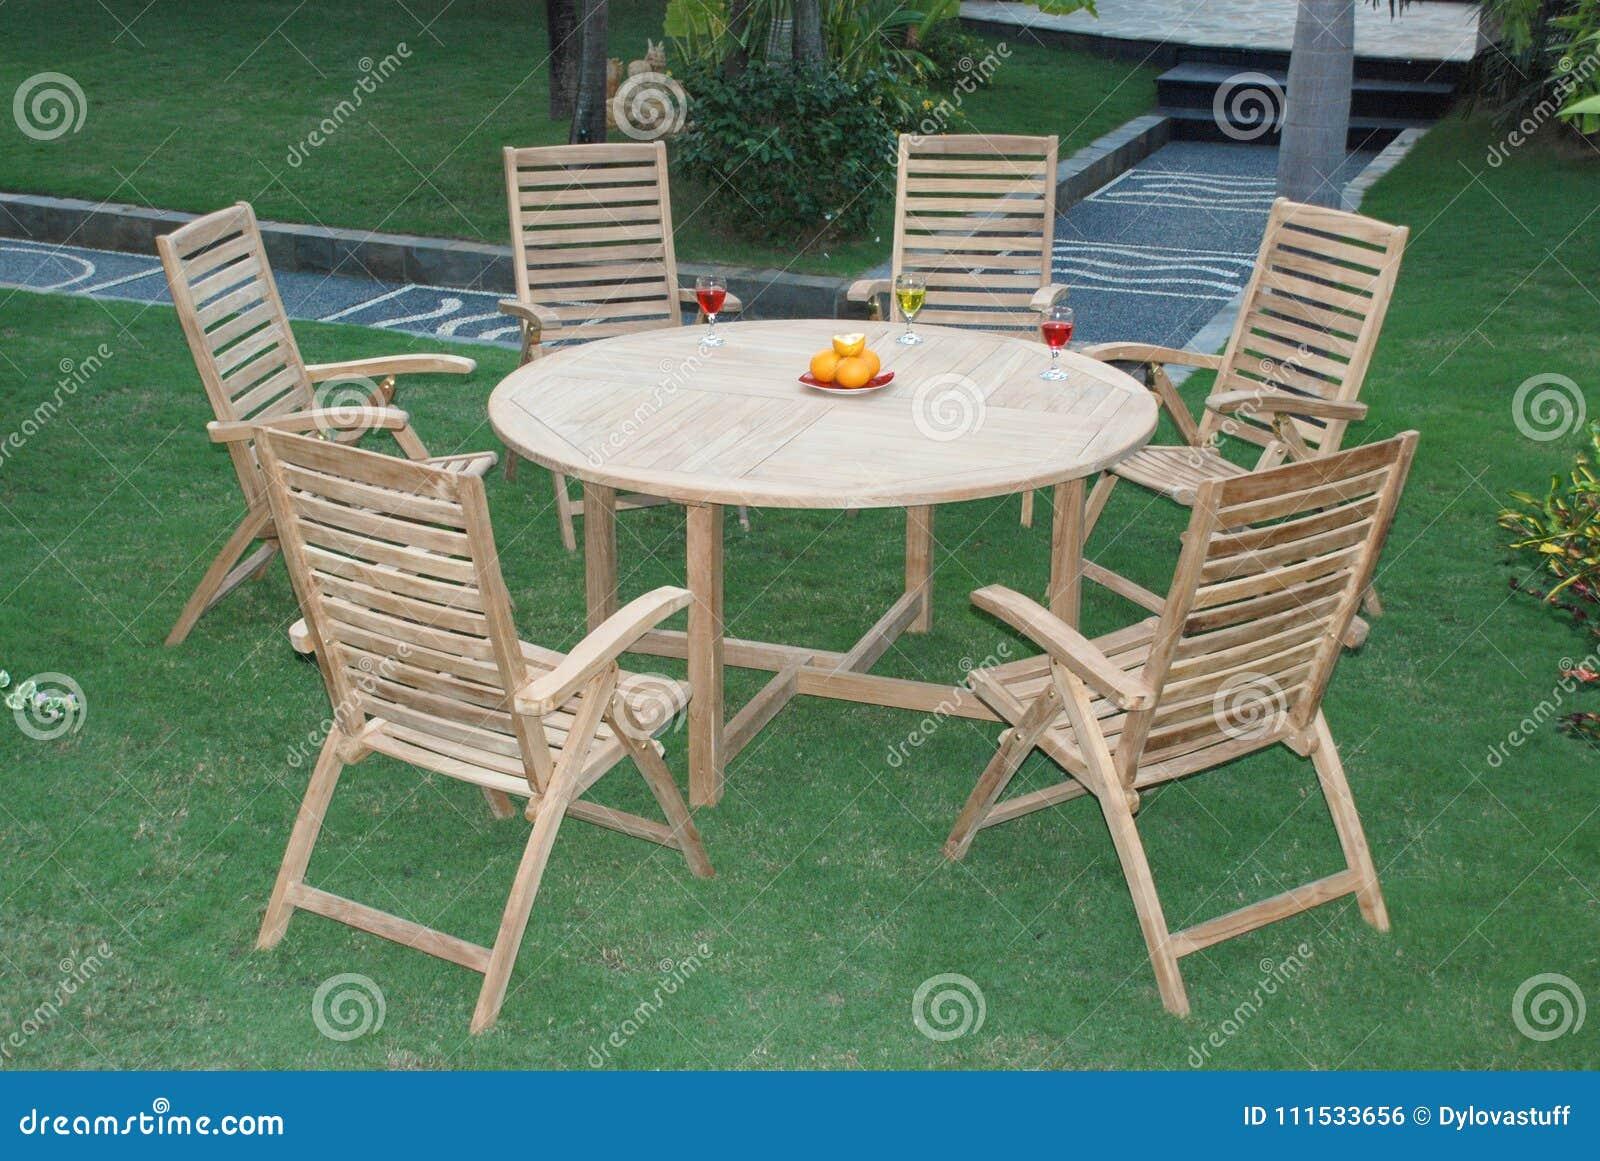 Magnificent Teak Garden Furniture Out Door Teak Garden Stock Photo Machost Co Dining Chair Design Ideas Machostcouk